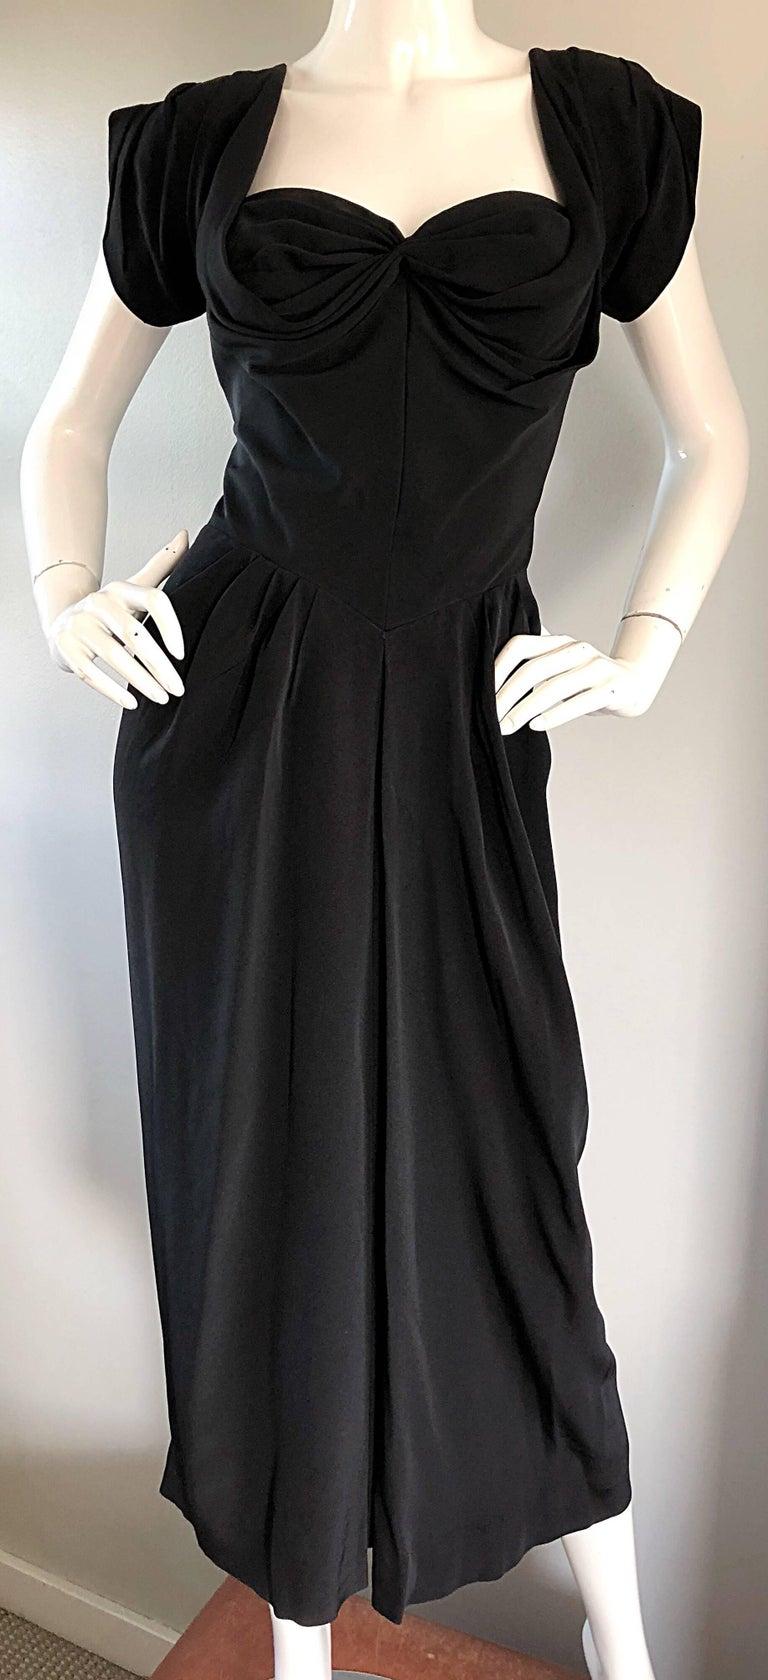 1950s Dorothy O'Hara Black Crepe Cap Sleeve Sweetheart Neck Vintage 50s Dress For Sale 5